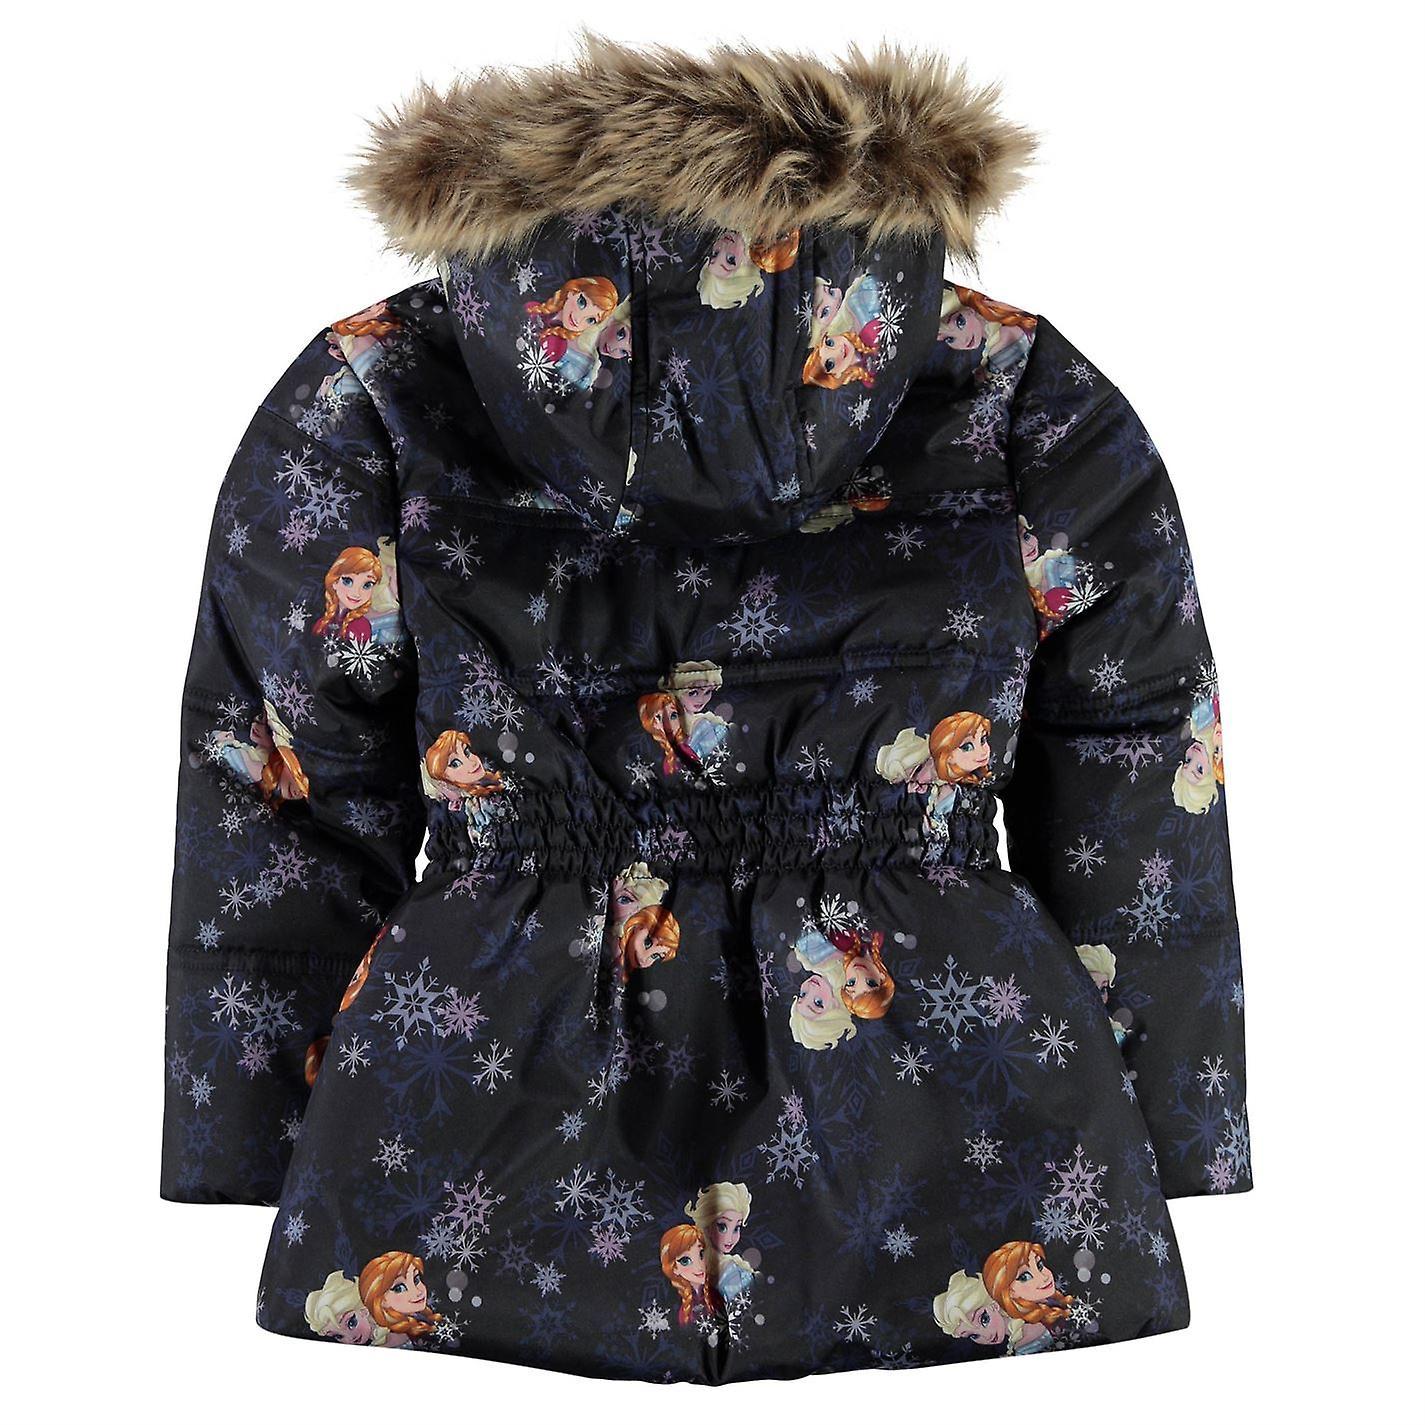 7dab52389 Character Kids Girls Padded Coat Infant Jacket Top Long Sleeve Hooded Zip  Full